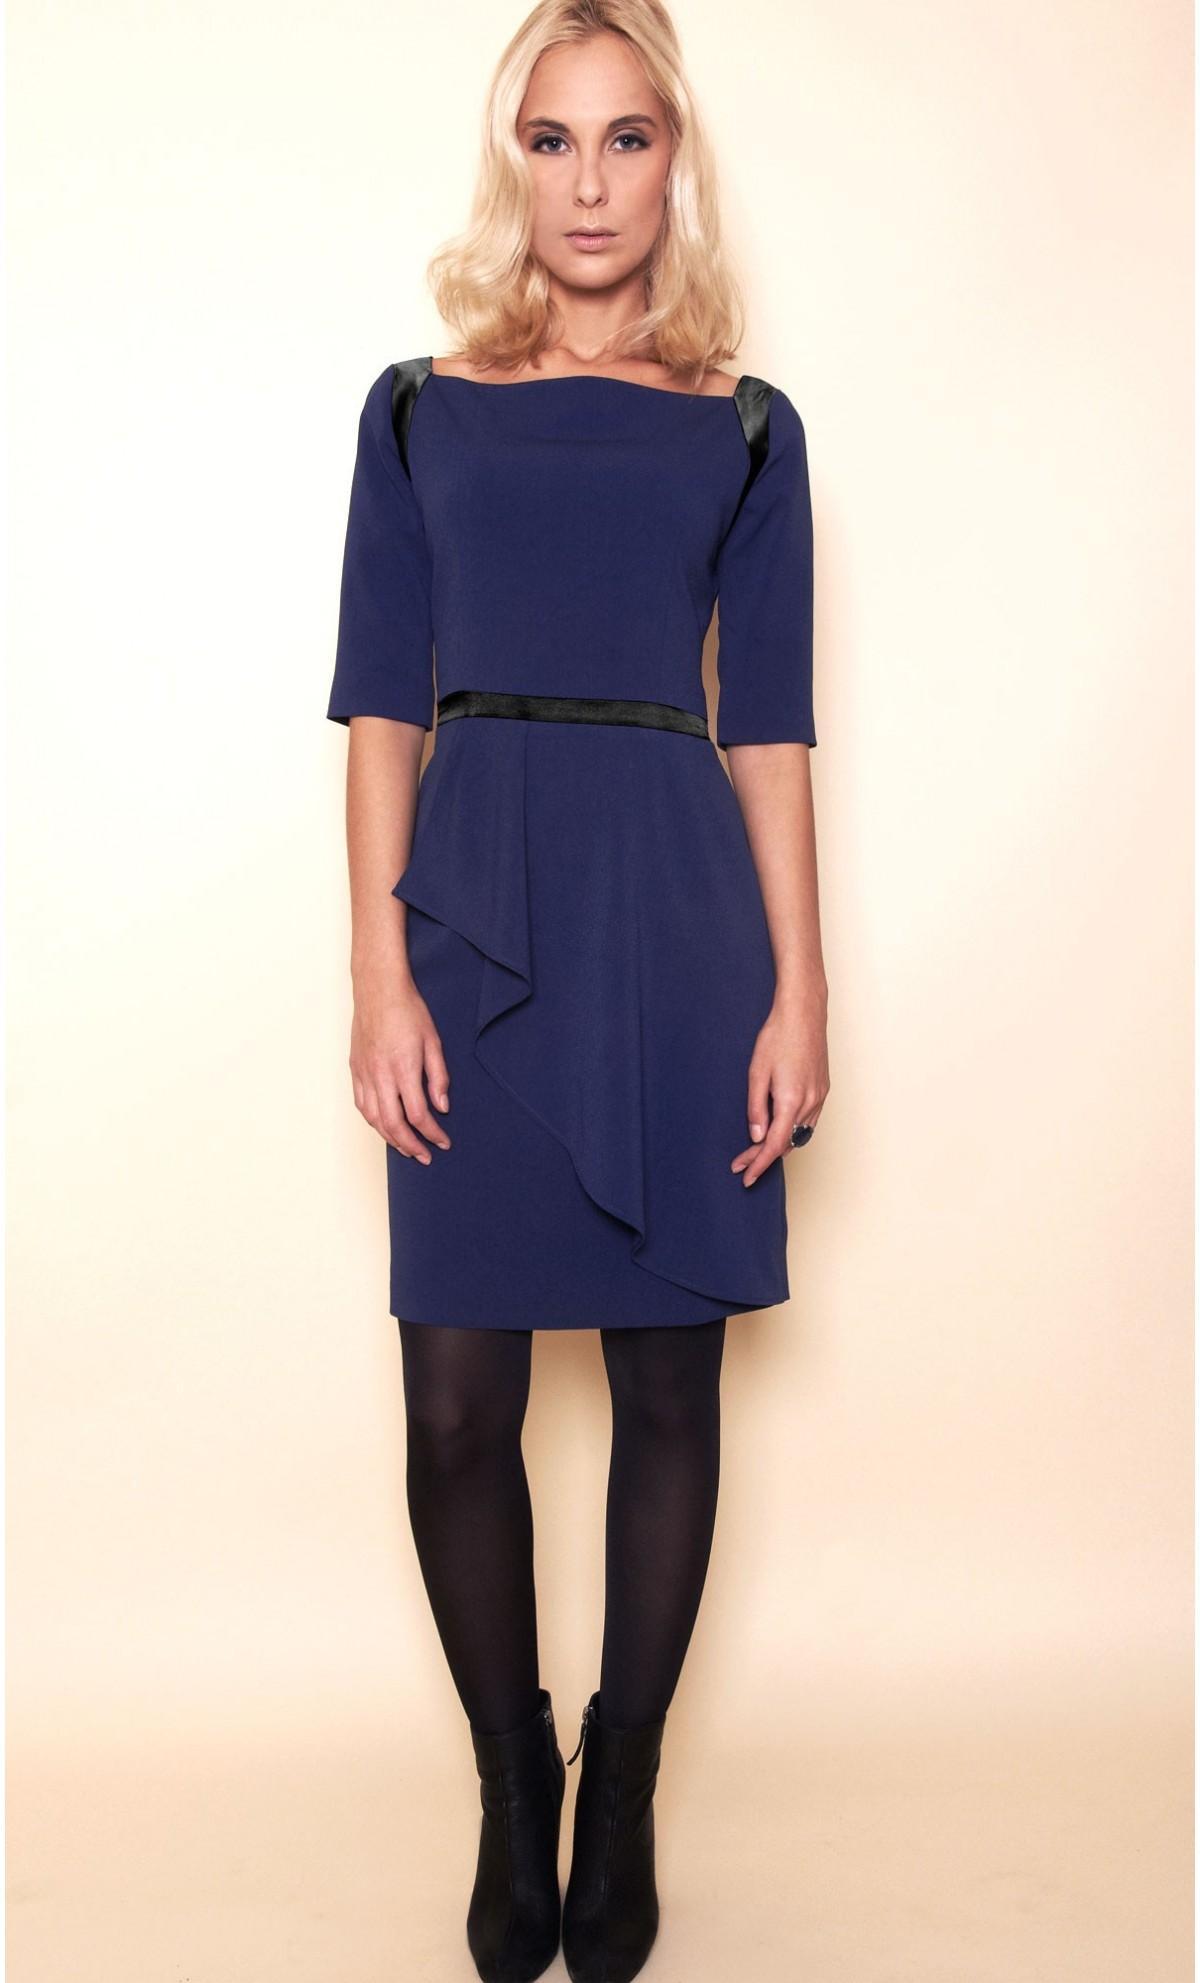 Comment porter une robe bleu marine